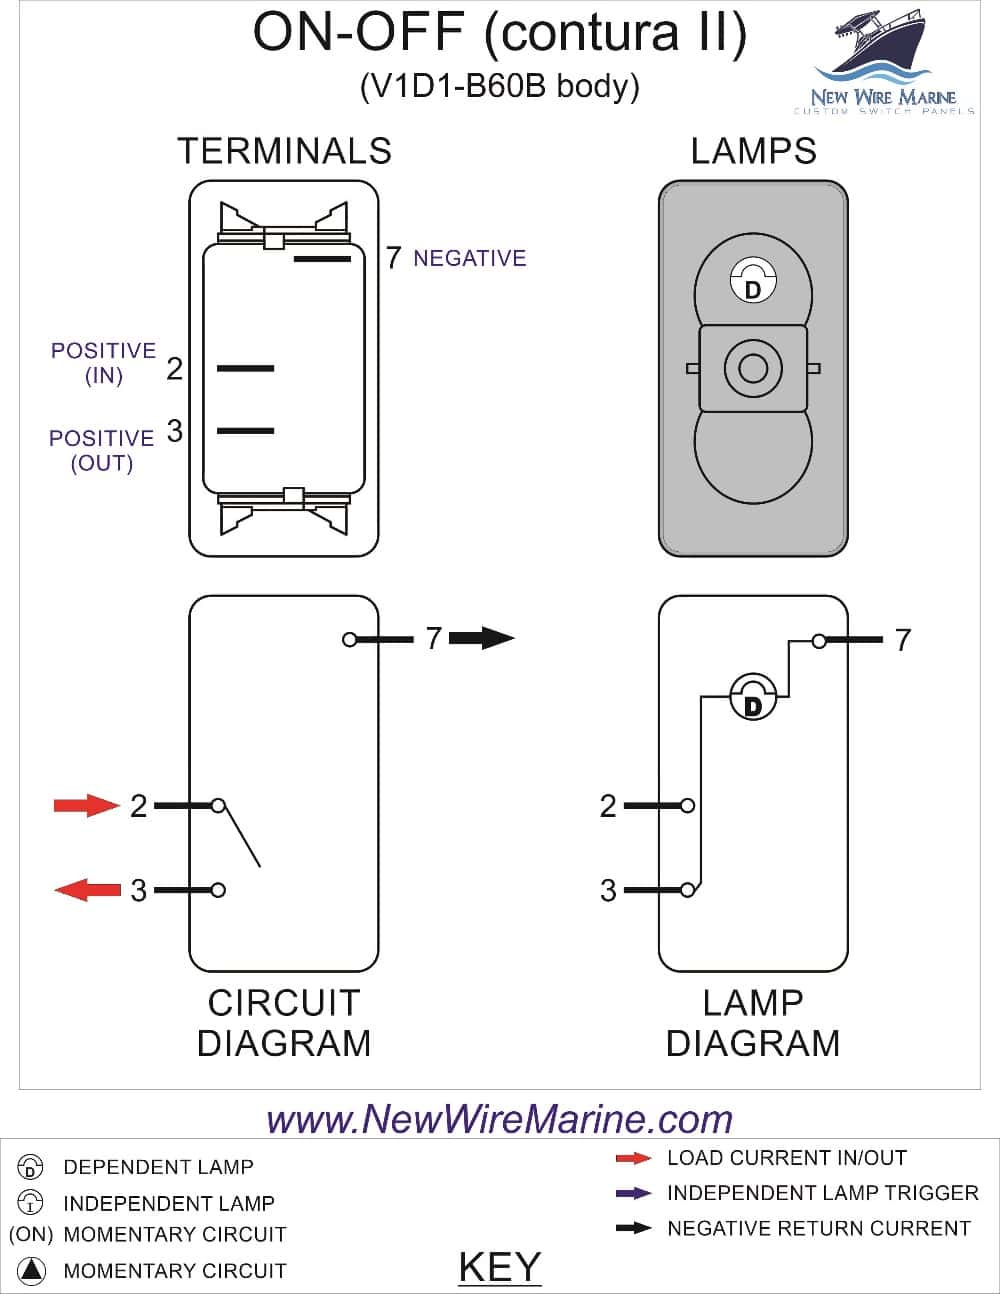 Rocker Switch Wiring Diagrams | New Wire Marine - 8 Pin Rocker Switch Wiring Diagram